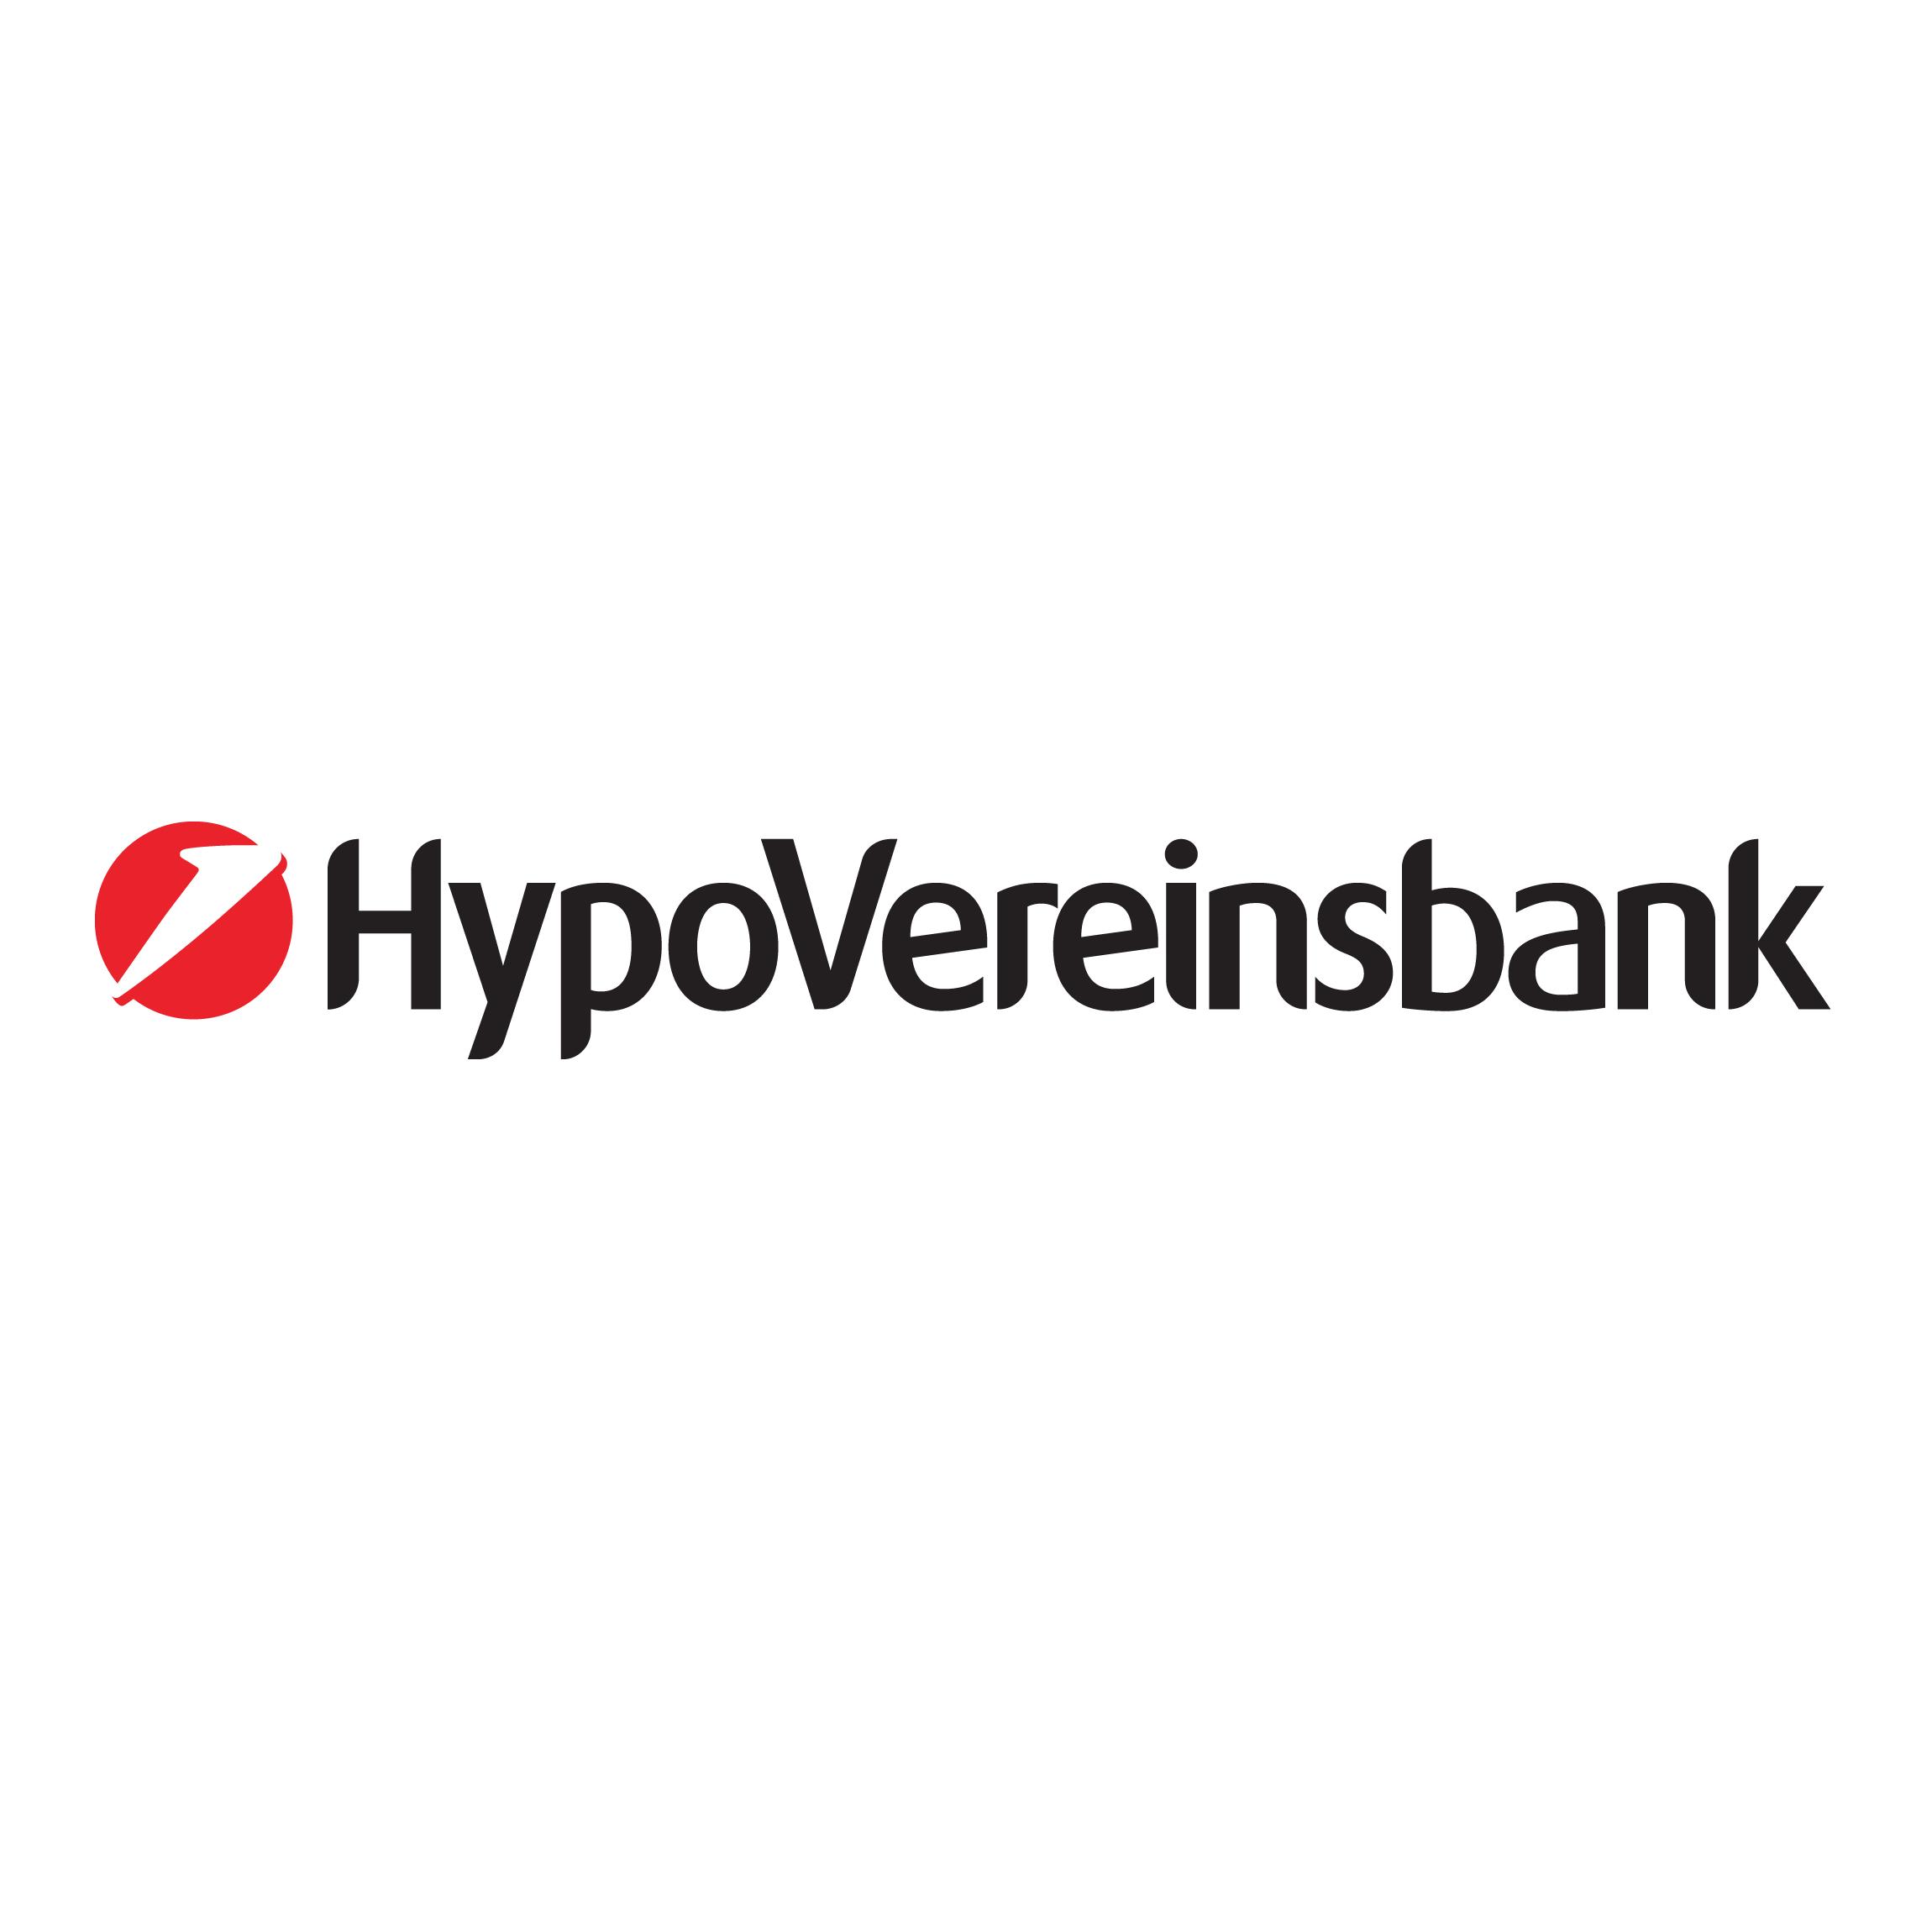 HypoVereinsbank Potsdam